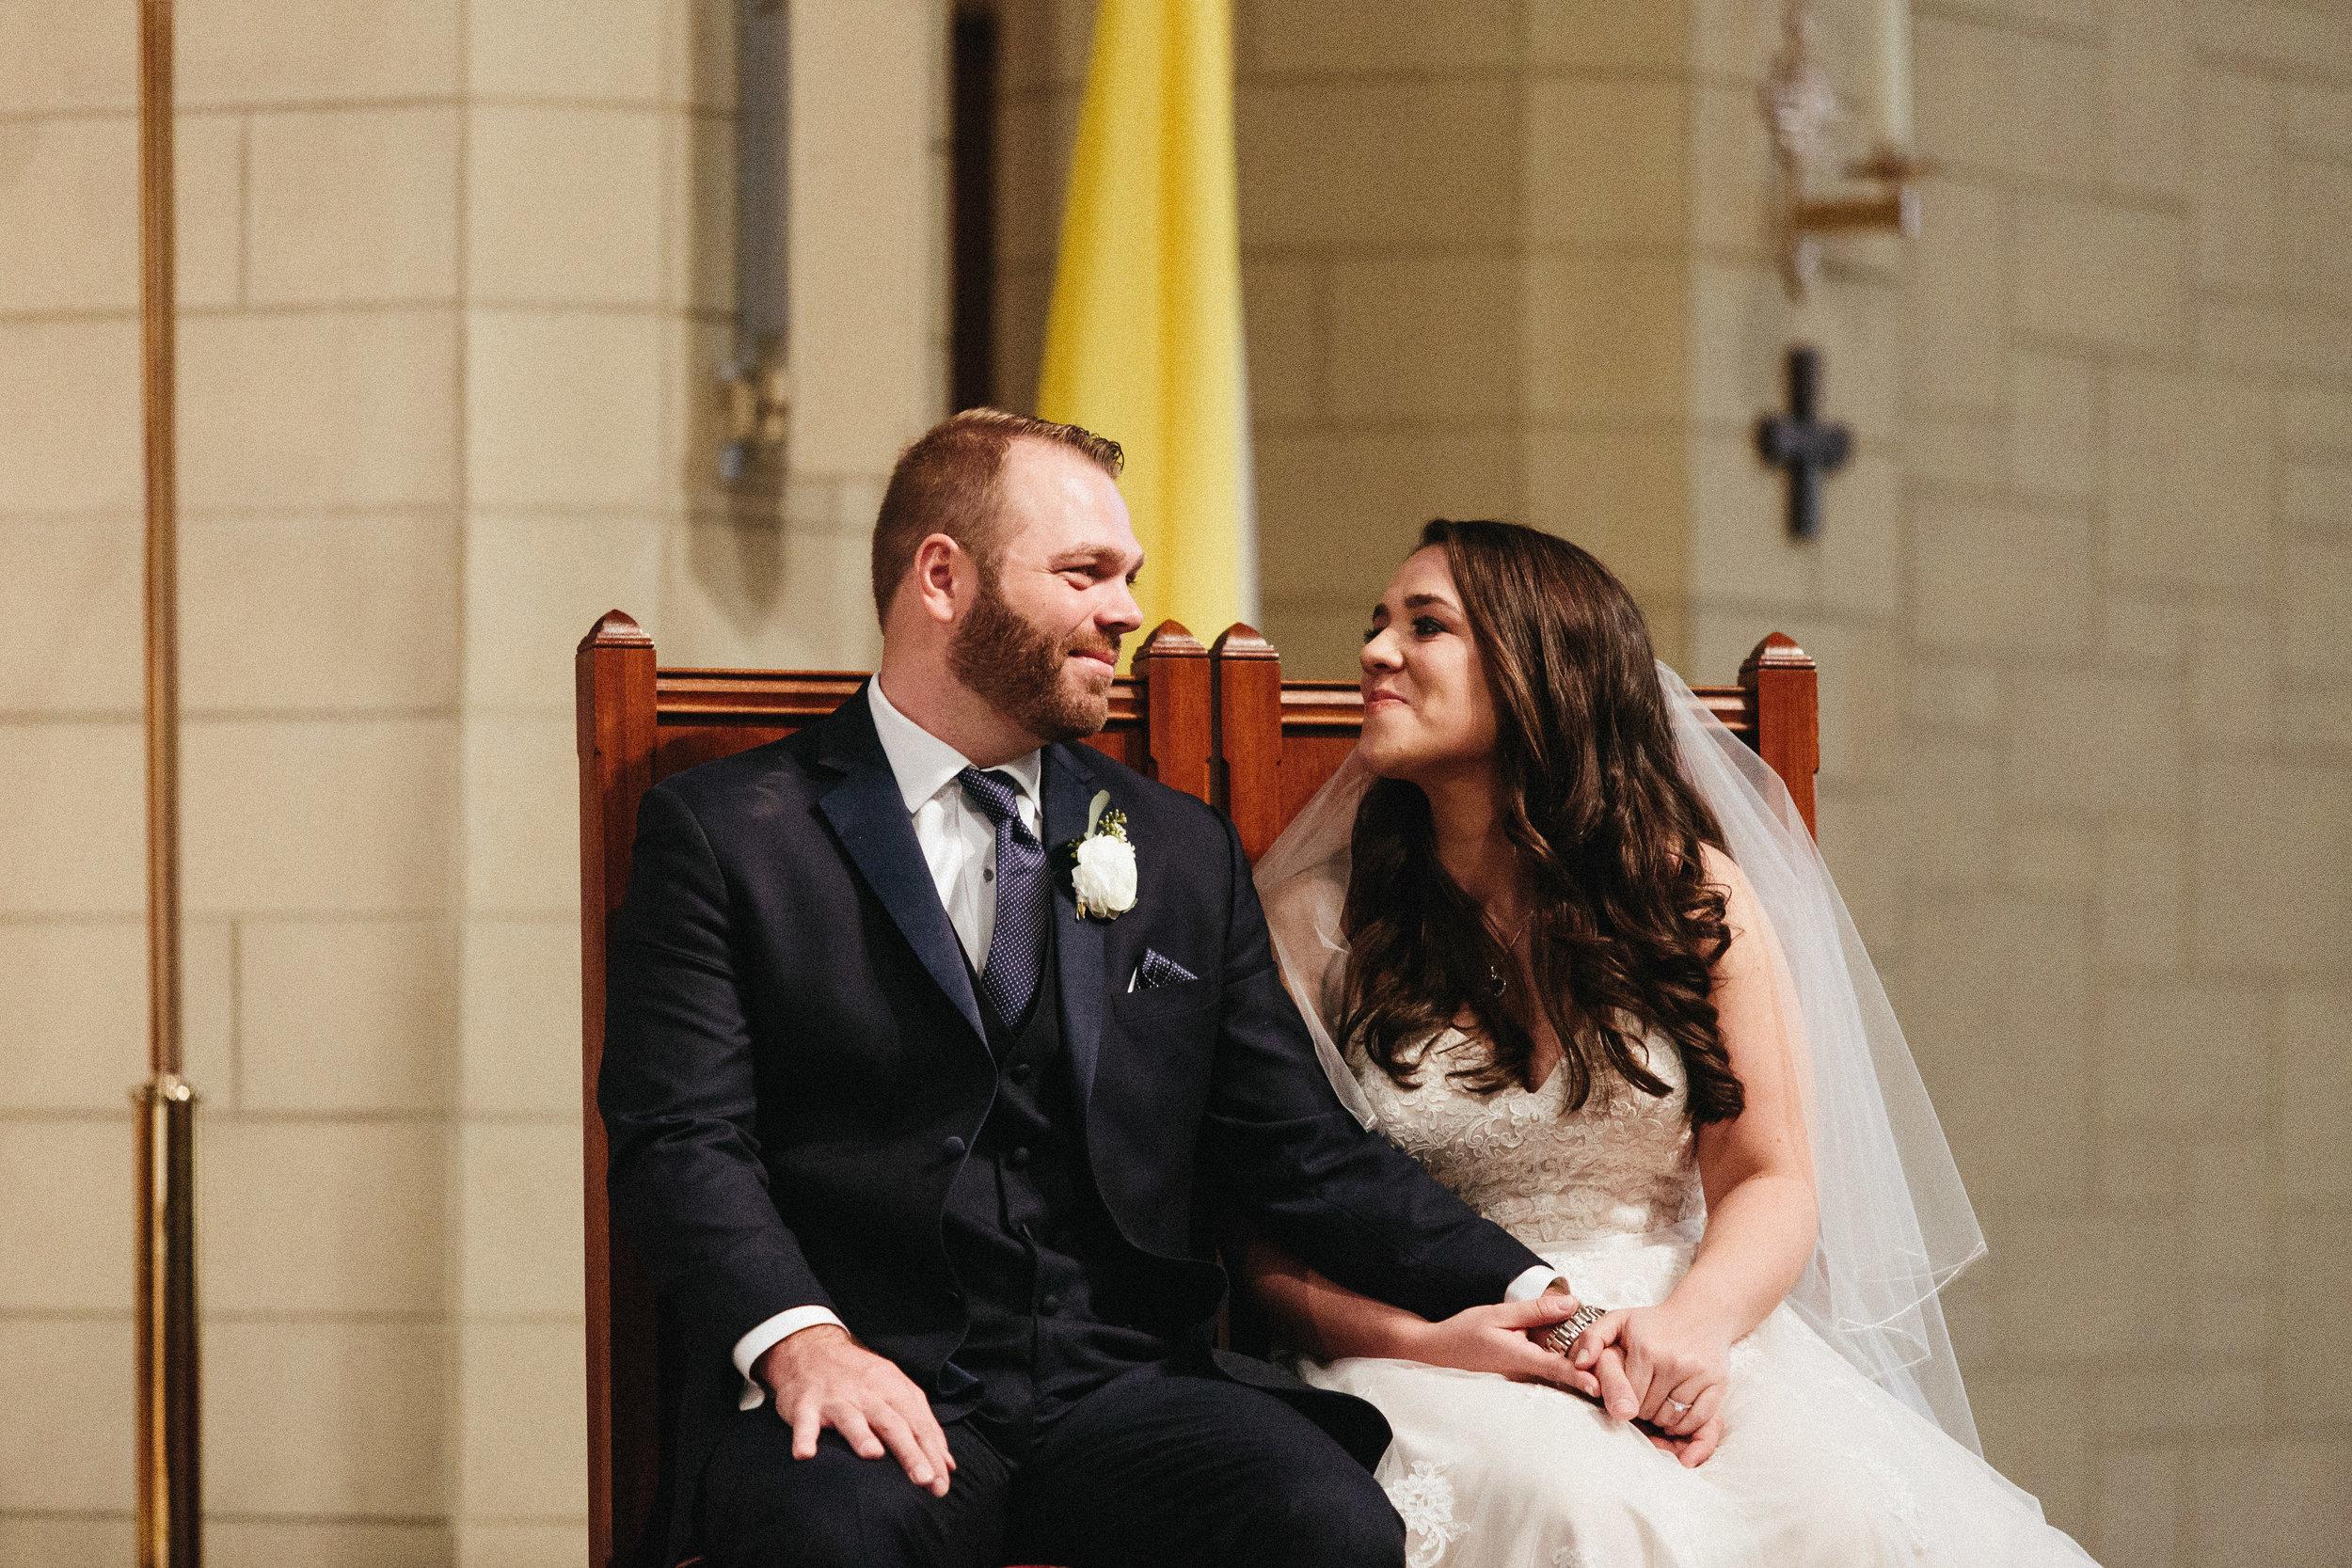 roswell_st_peter_chanel_catholic_avalon_hotel_alpharetta_wedding-1502.jpg